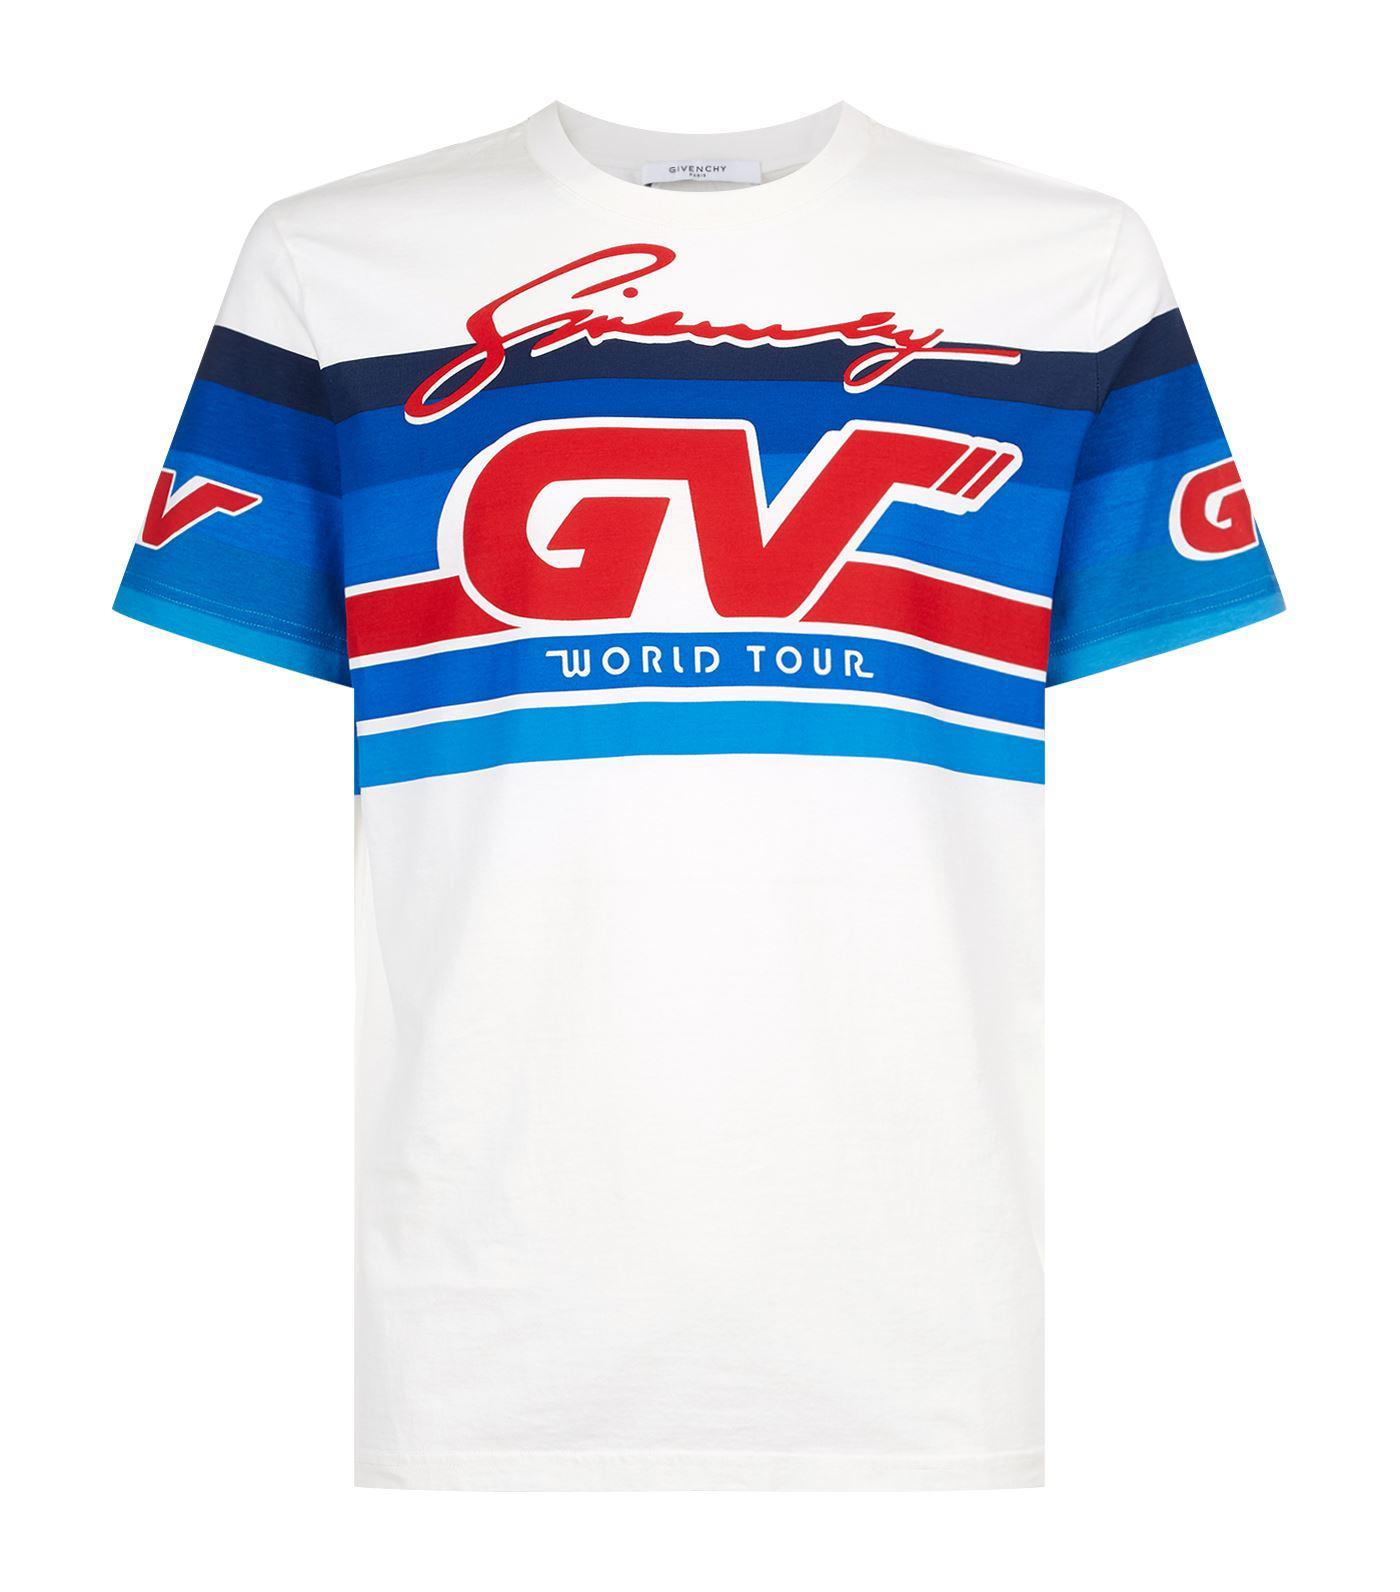 motorcross logo print t-shirt Givenchy Amazon For Sale Geniue Stockist Online Low Price Cheap Price IaZj9Gwl